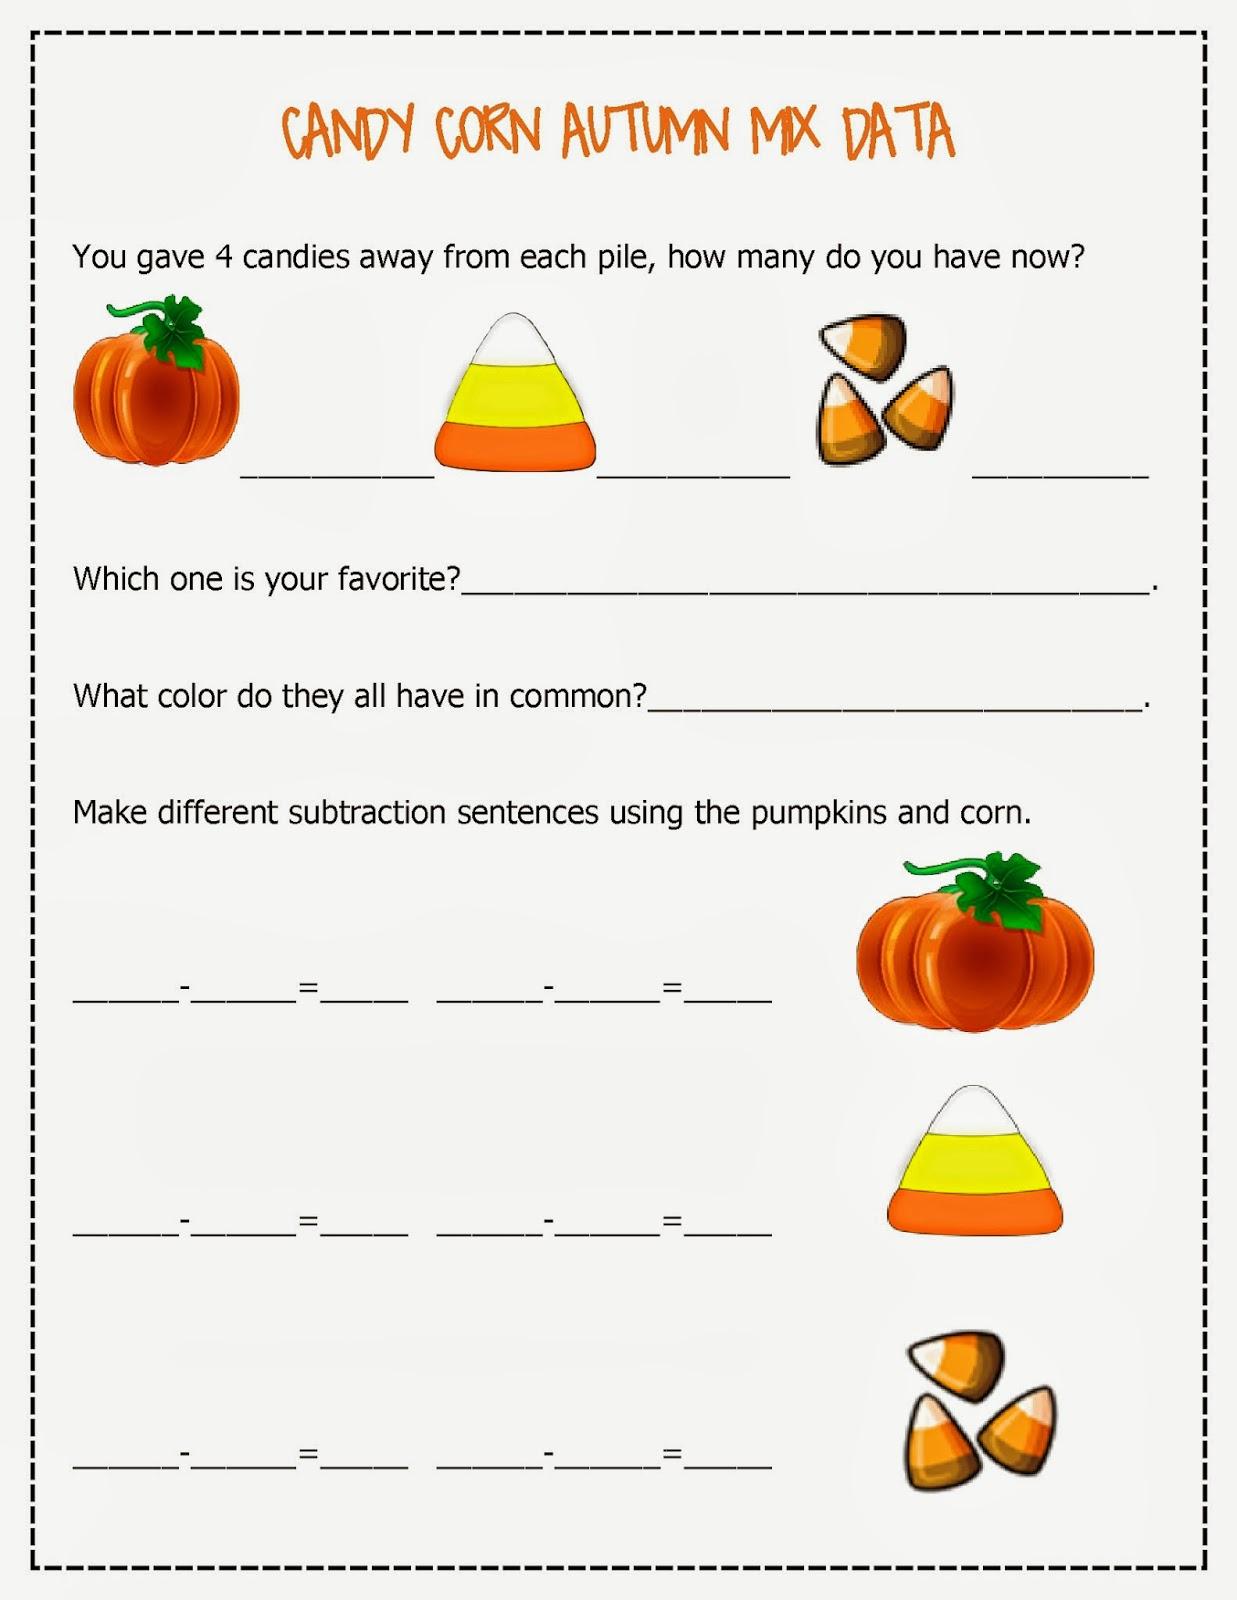 Candy Corn Autumn Mix Free Math Worksheets